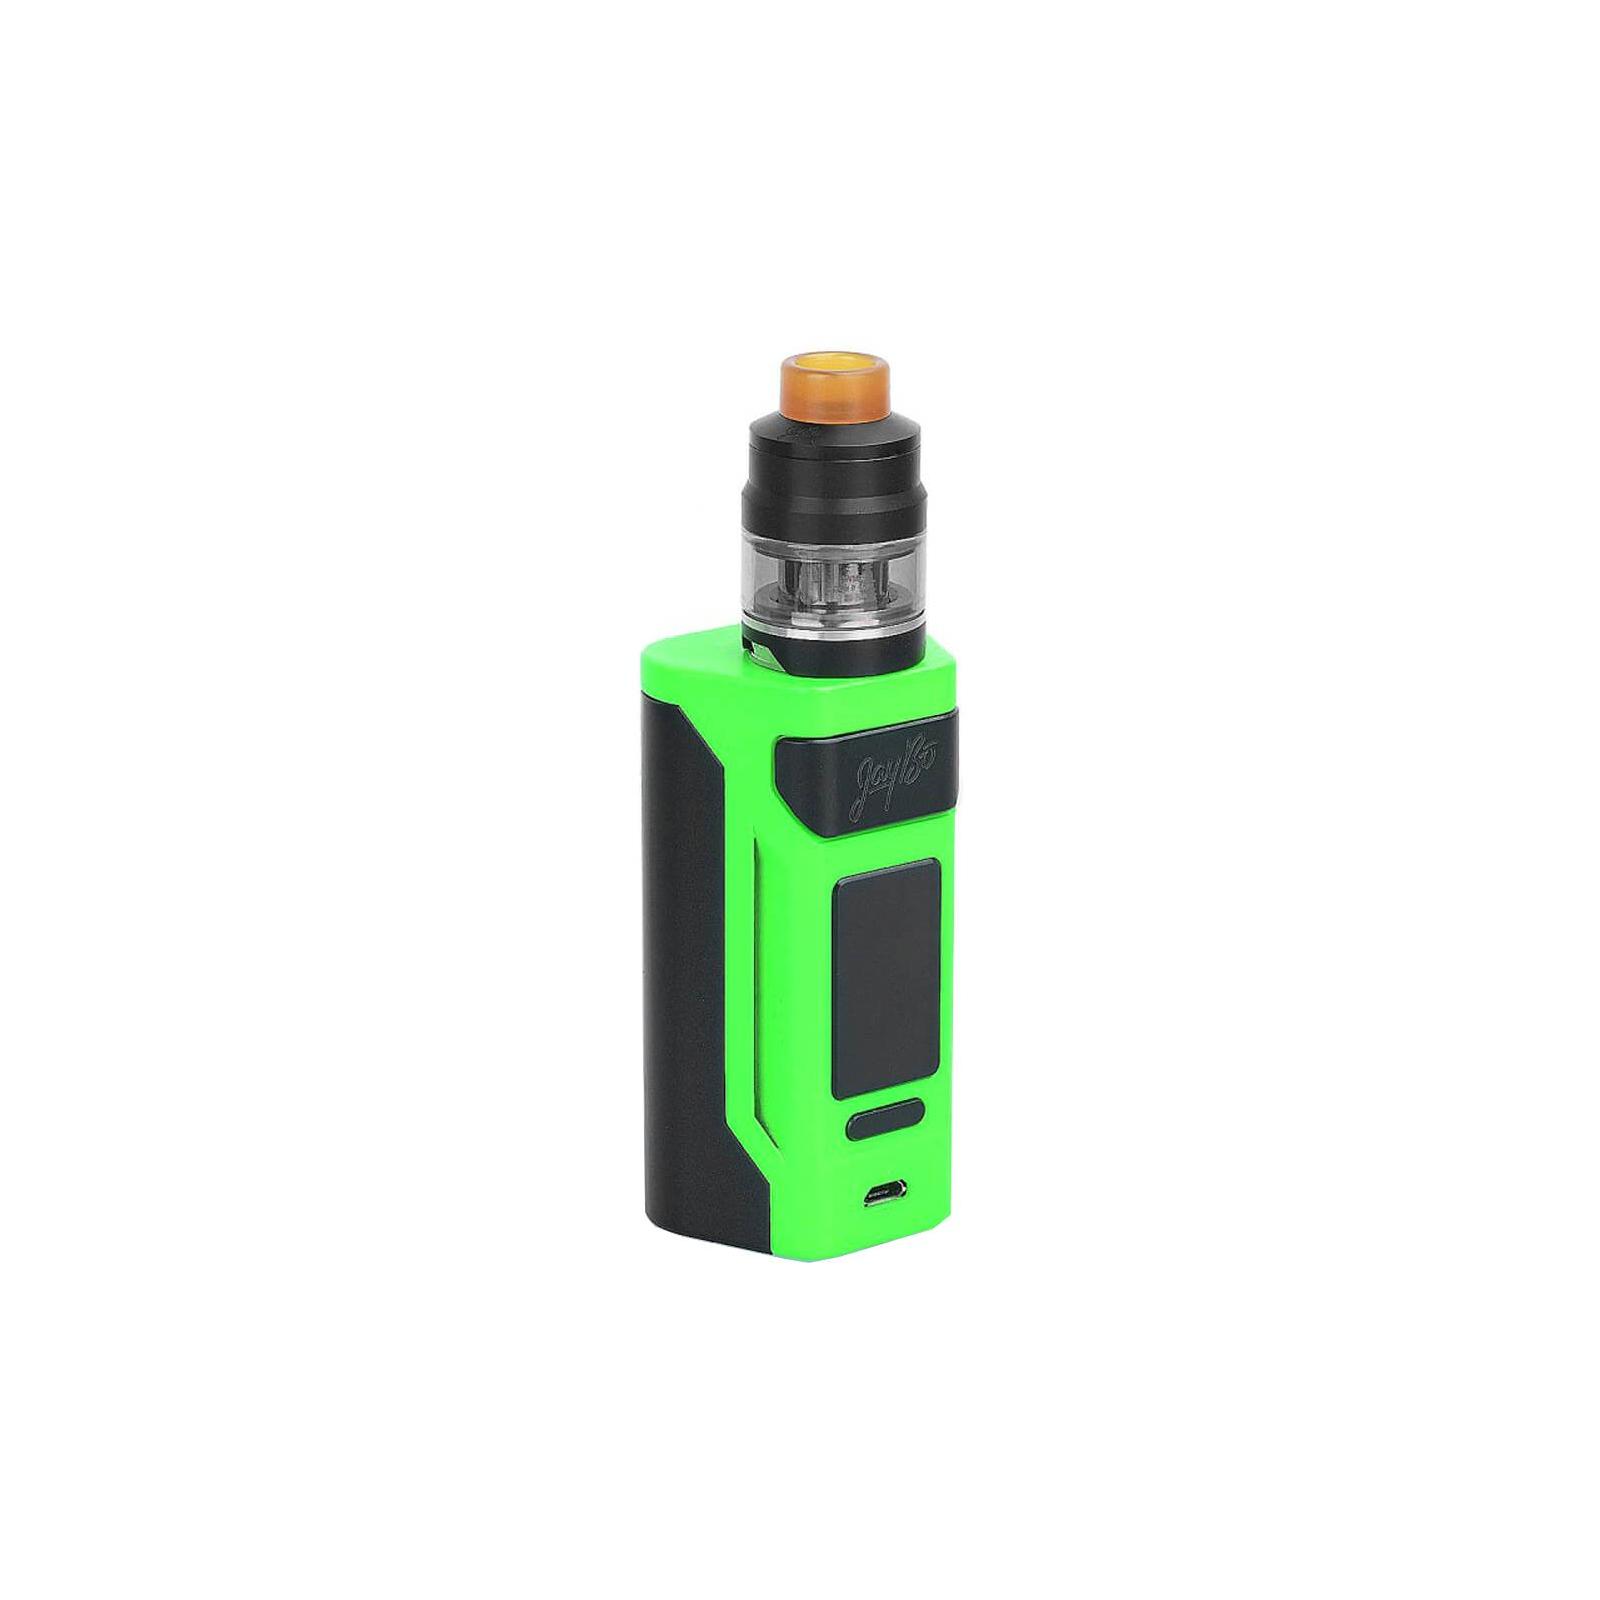 Стартовый набор Wismec Reuleaux RX2 20700 with Gnome Tank Kit Green (WISRX2KGR)